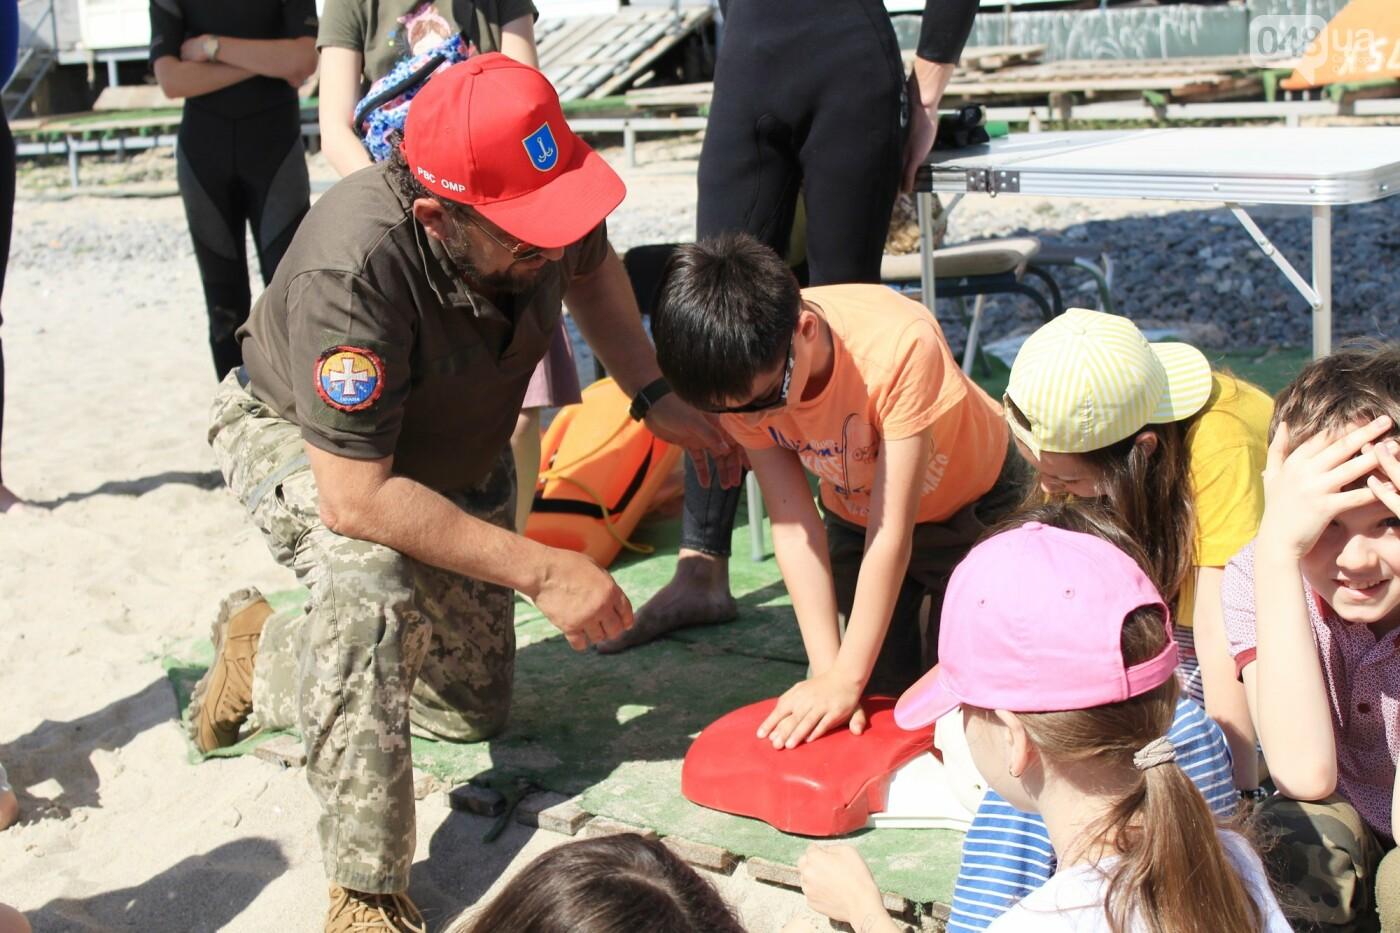 Школьники спасали утопающих: на Ланжероне в Одессе провели учения, - ФОТО, ВИДЕО , фото-4